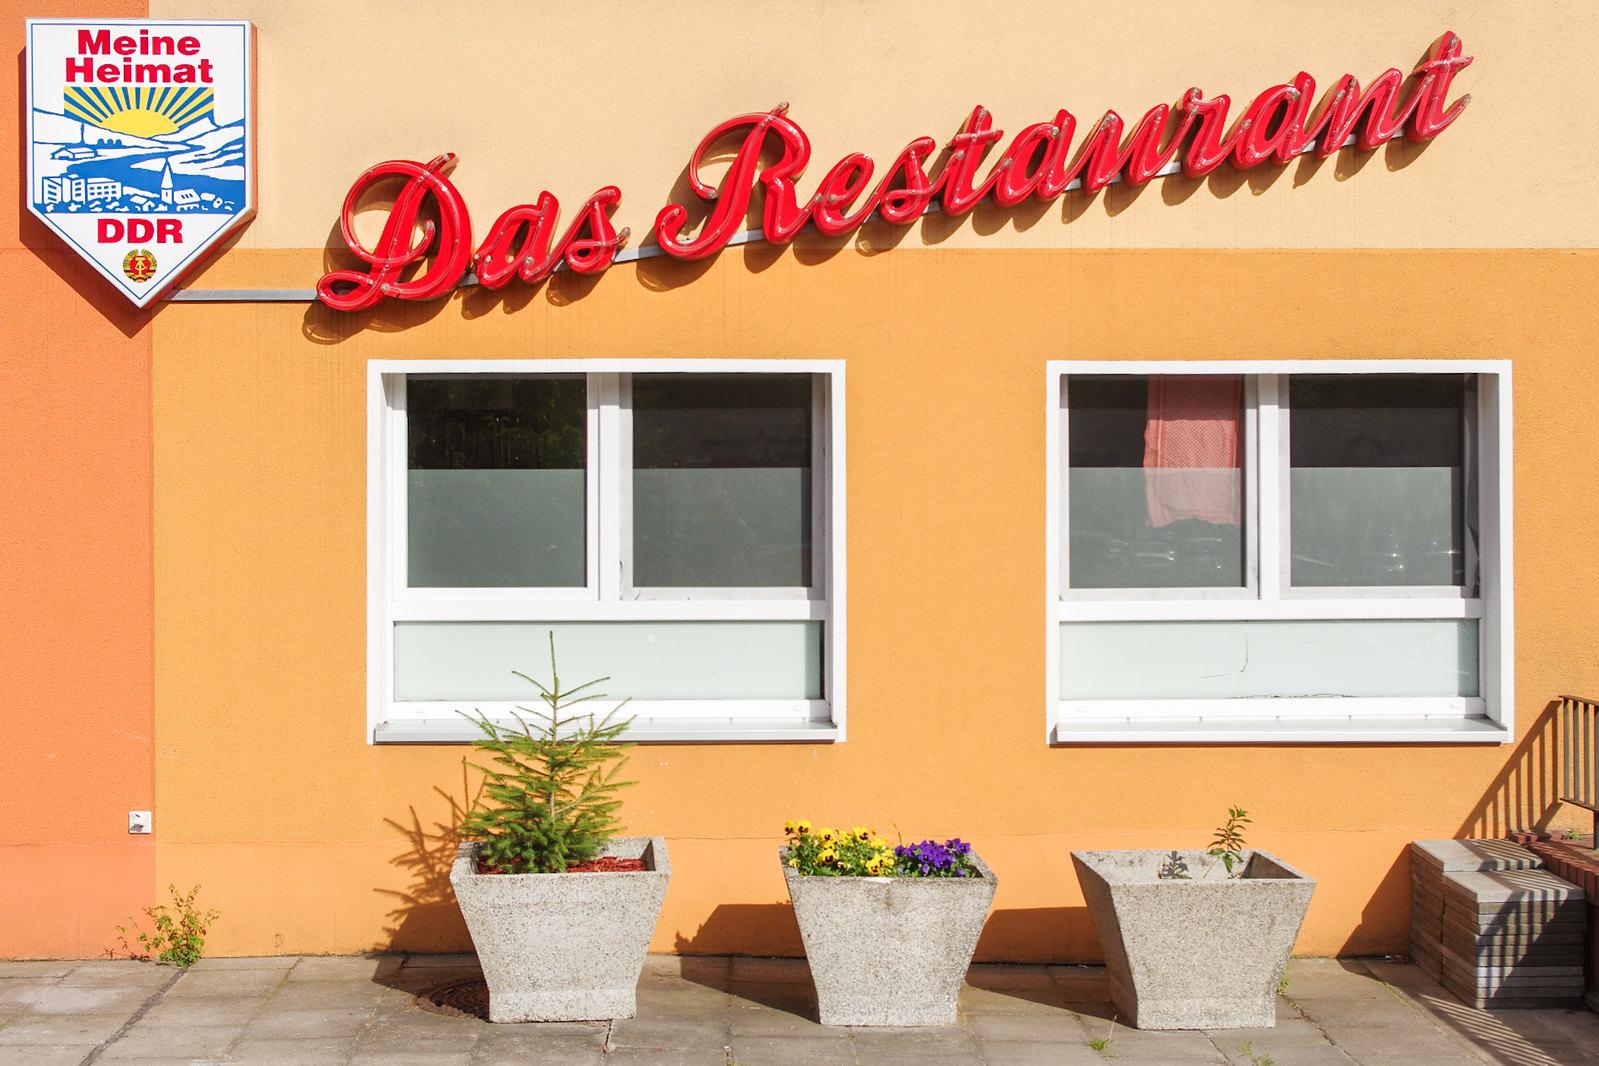 Berlin pauvre et sexy ? - Enseigne old school